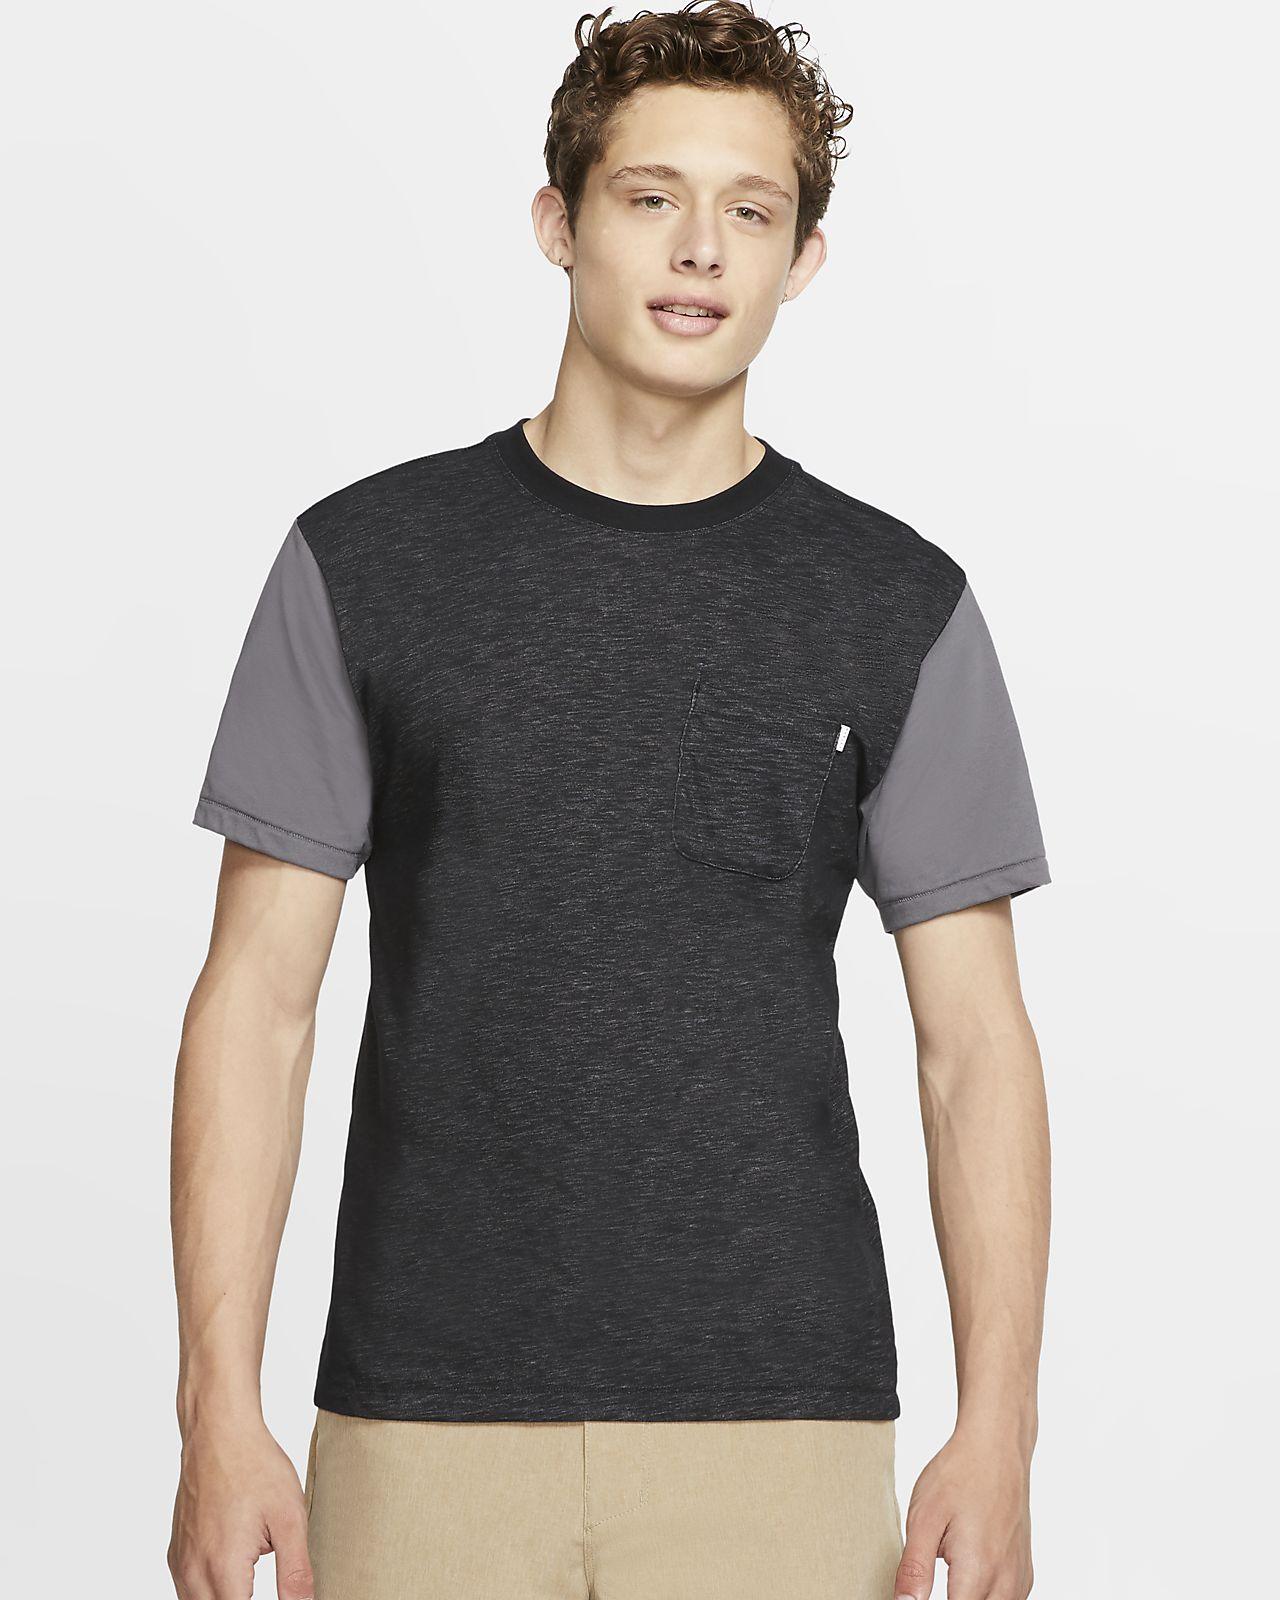 Hurley Dri-FIT Bridge Men's Short-Sleeve Knit Shirt